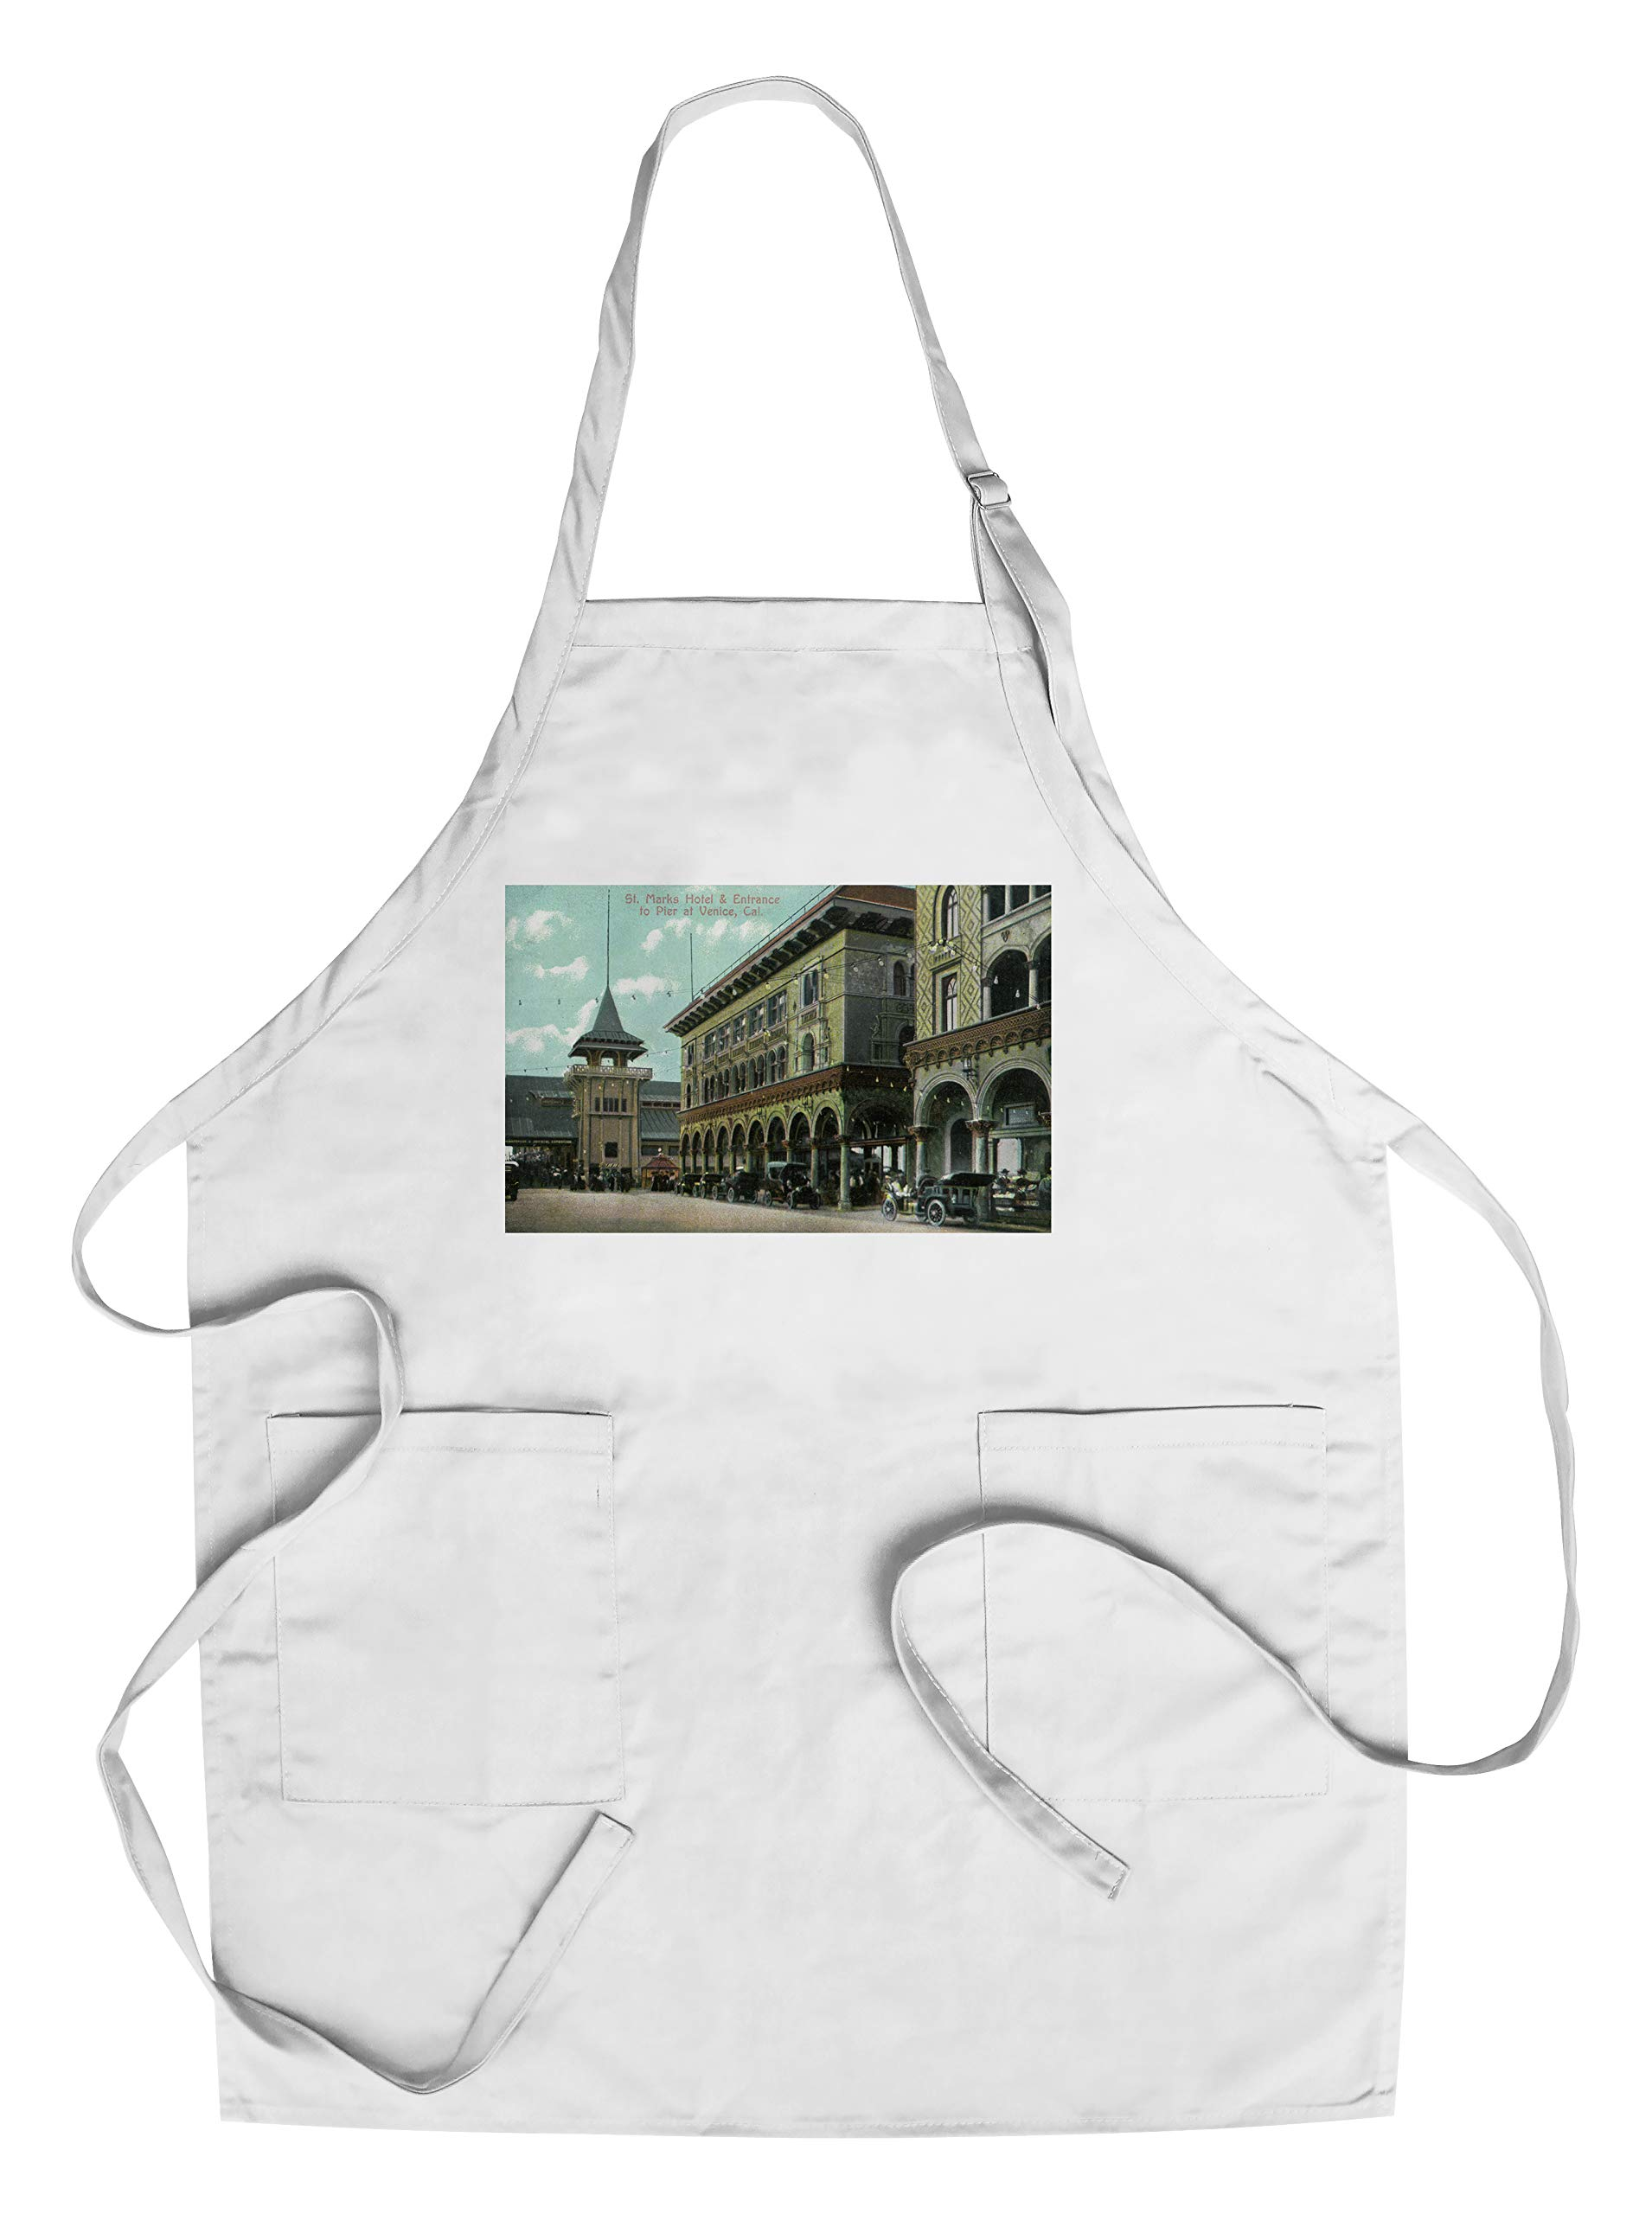 Venice, California - St. Mark's Hotel Entrance View (Cotton/Polyester Chef's Apron)